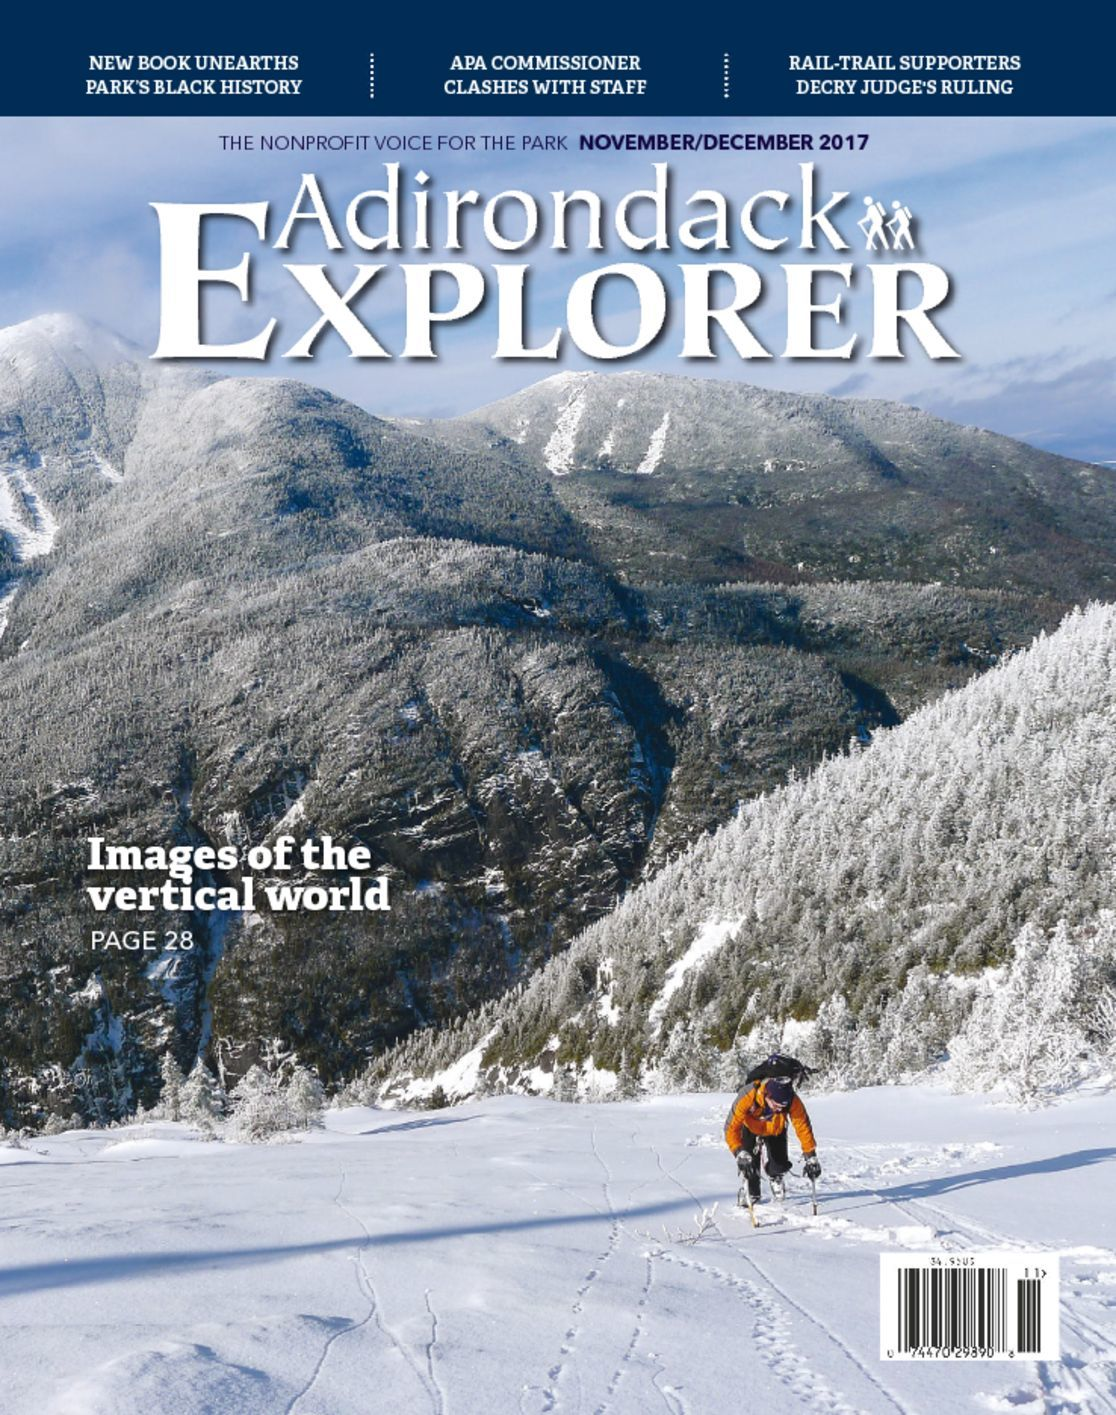 Adirondack Explorer Digital